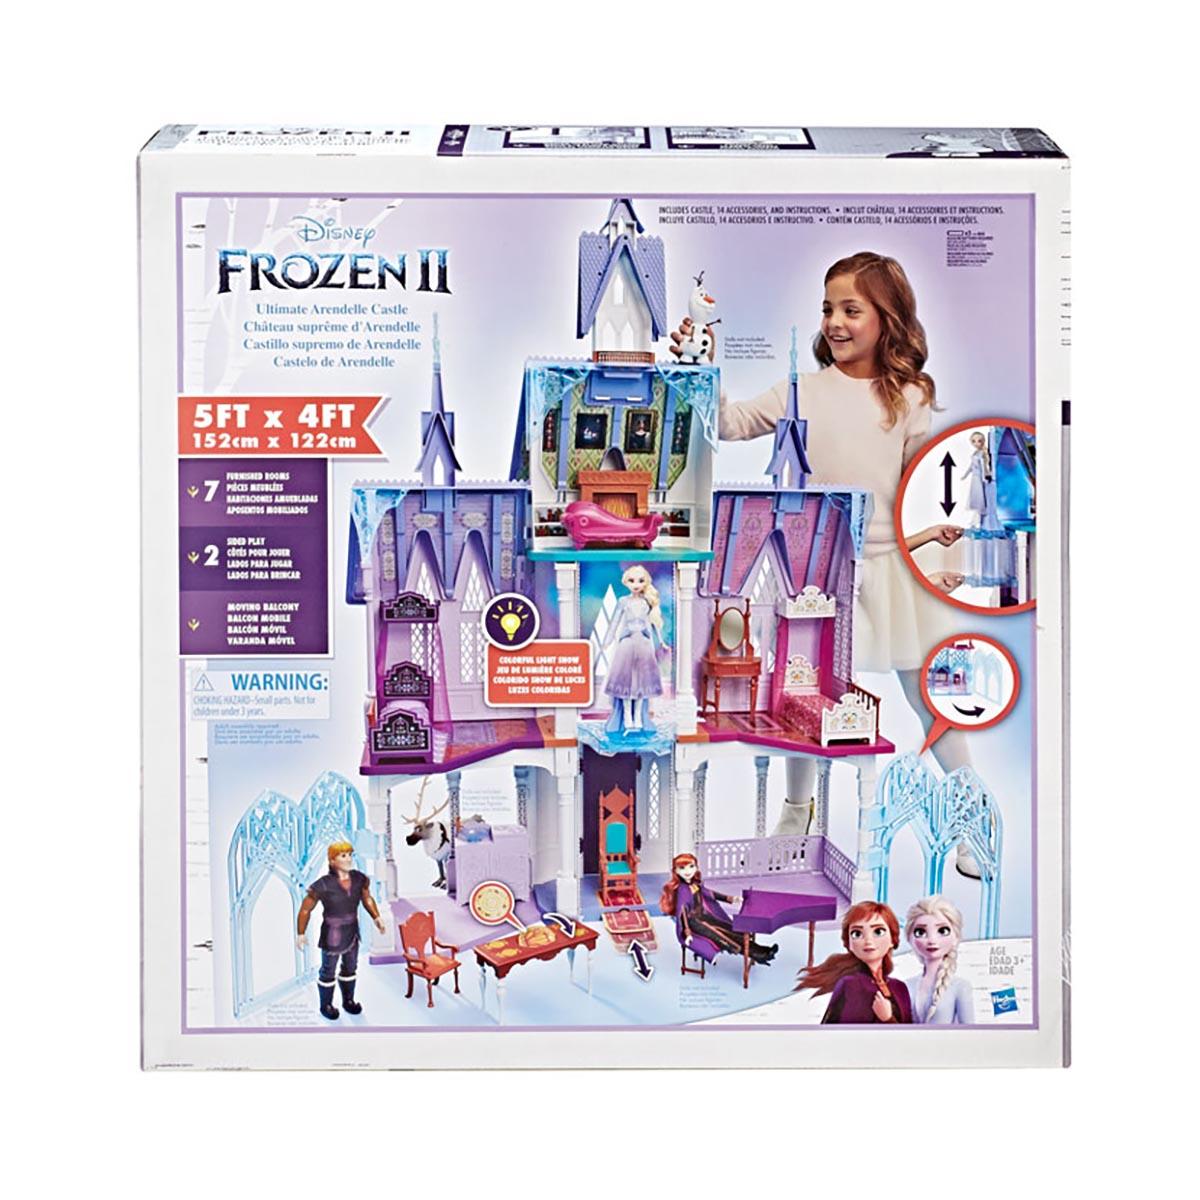 Castelul din Arendelle Disney Frozen 2, 152 cm